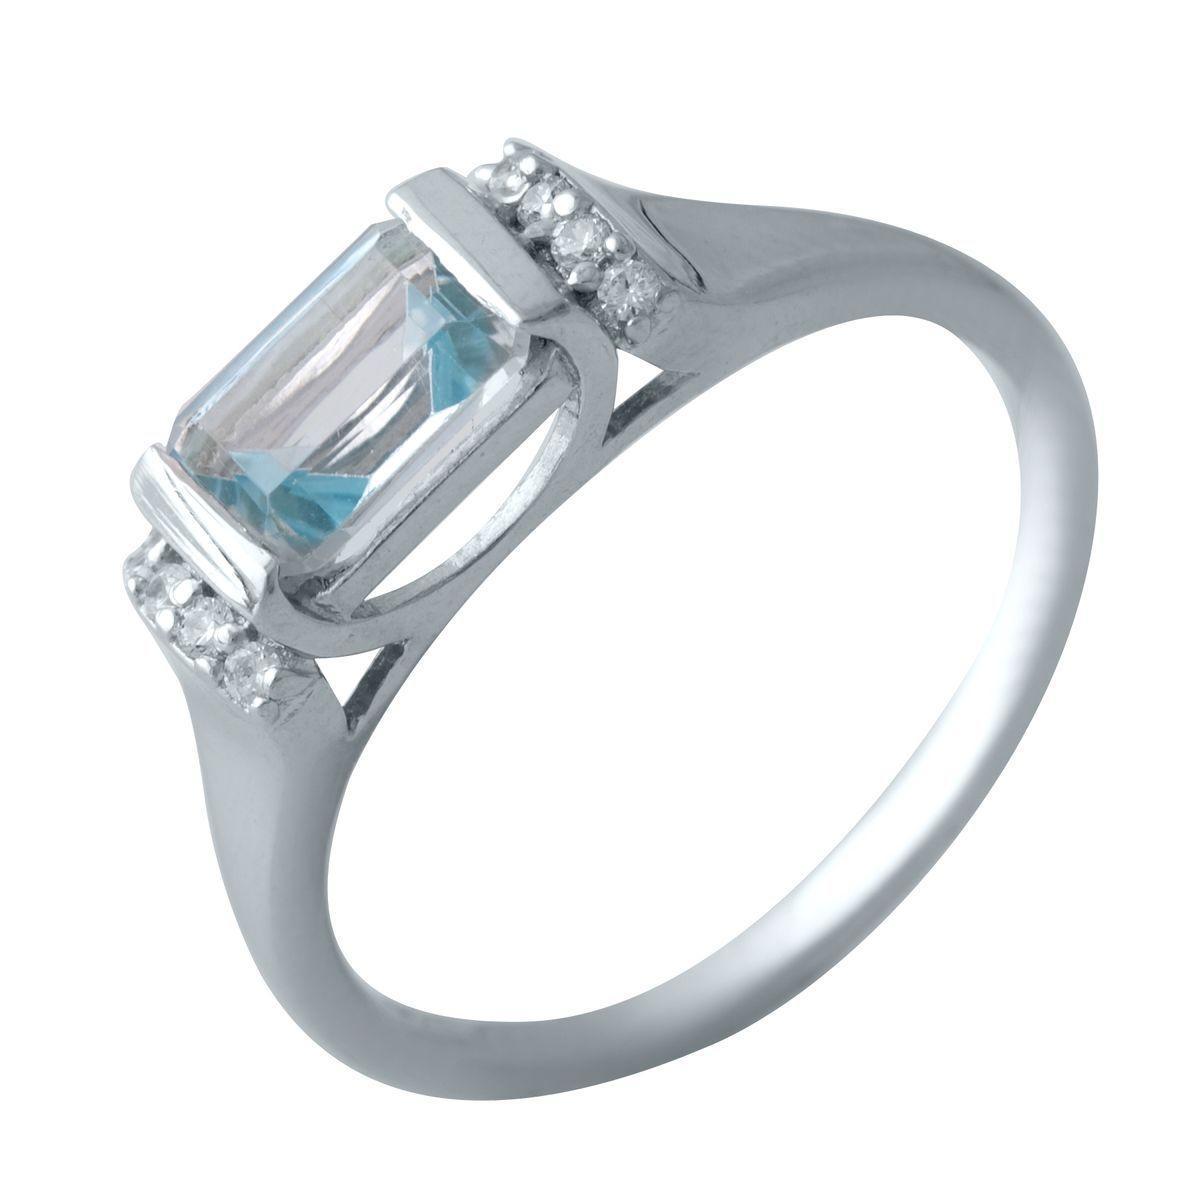 Серебряное кольцо DreamJewelry с натуральным топазом 3.347ct (2018995) 18 размер